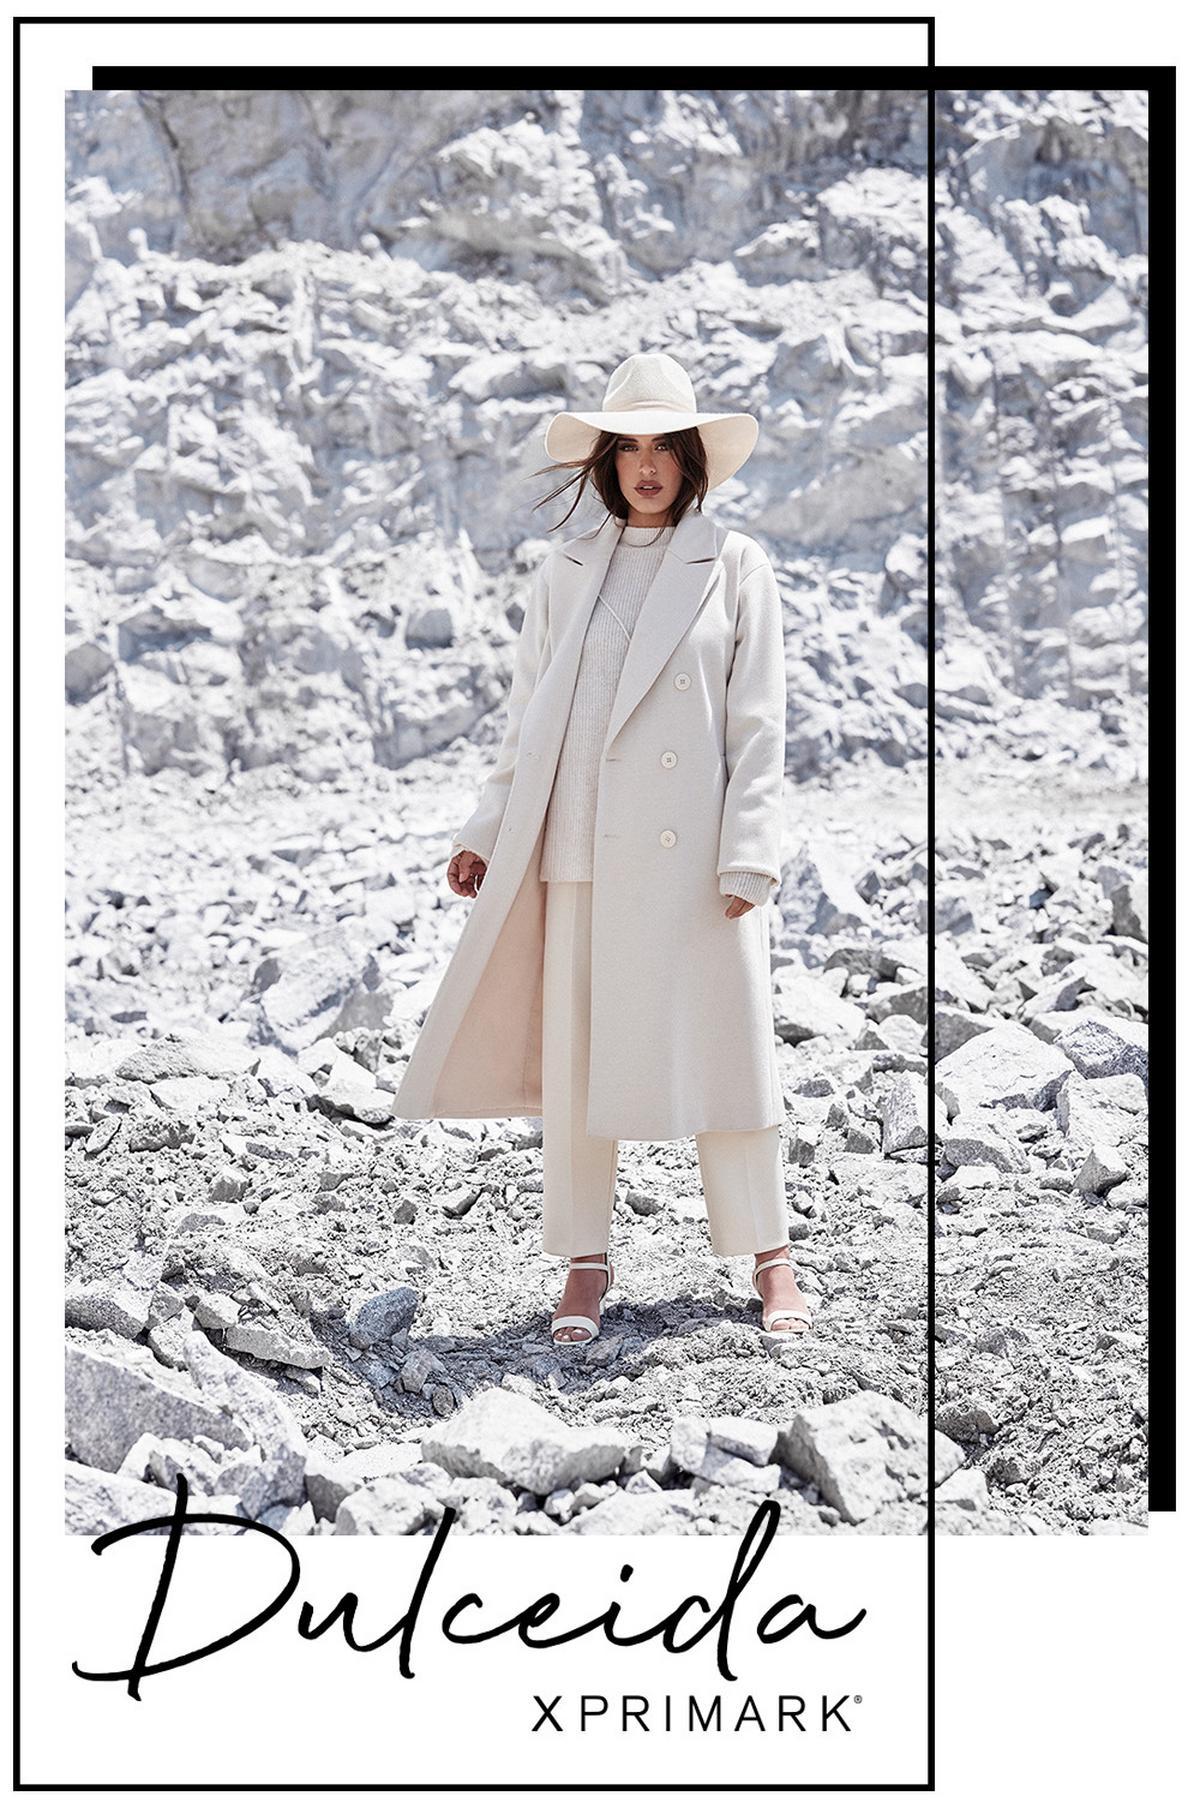 dulceida x primark abrigo blanco dulceida primark